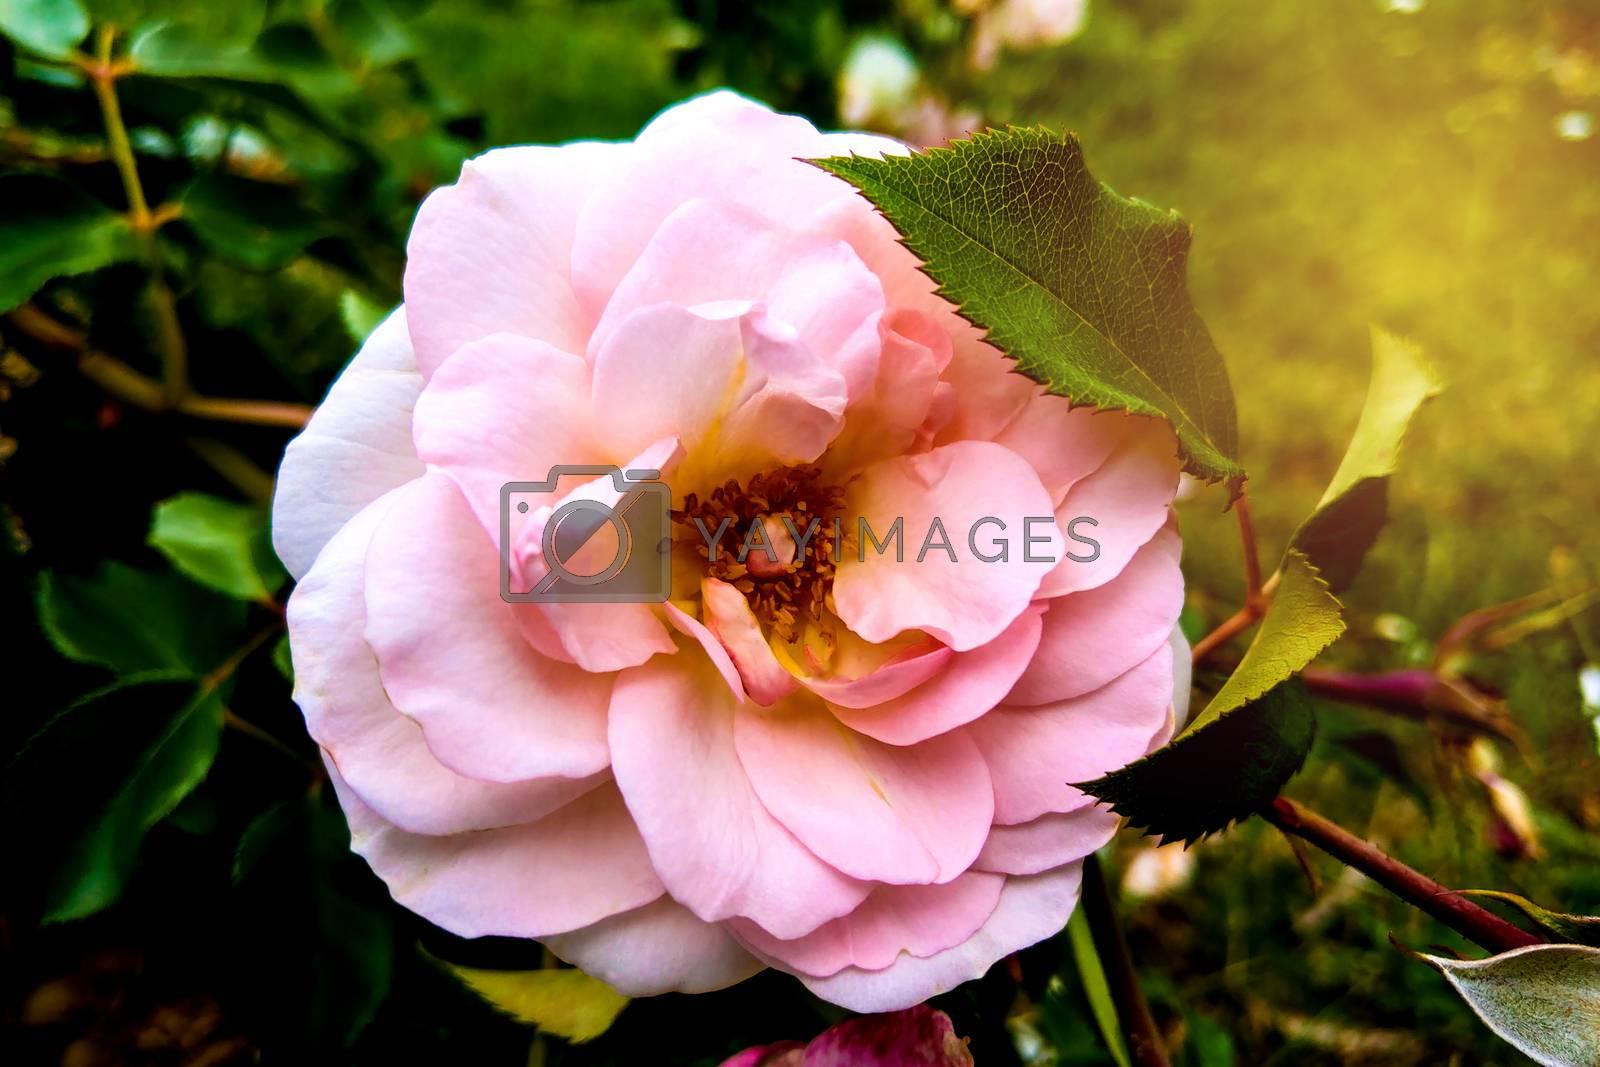 Pink Rose flower bloom on background blurry roses in roses garden